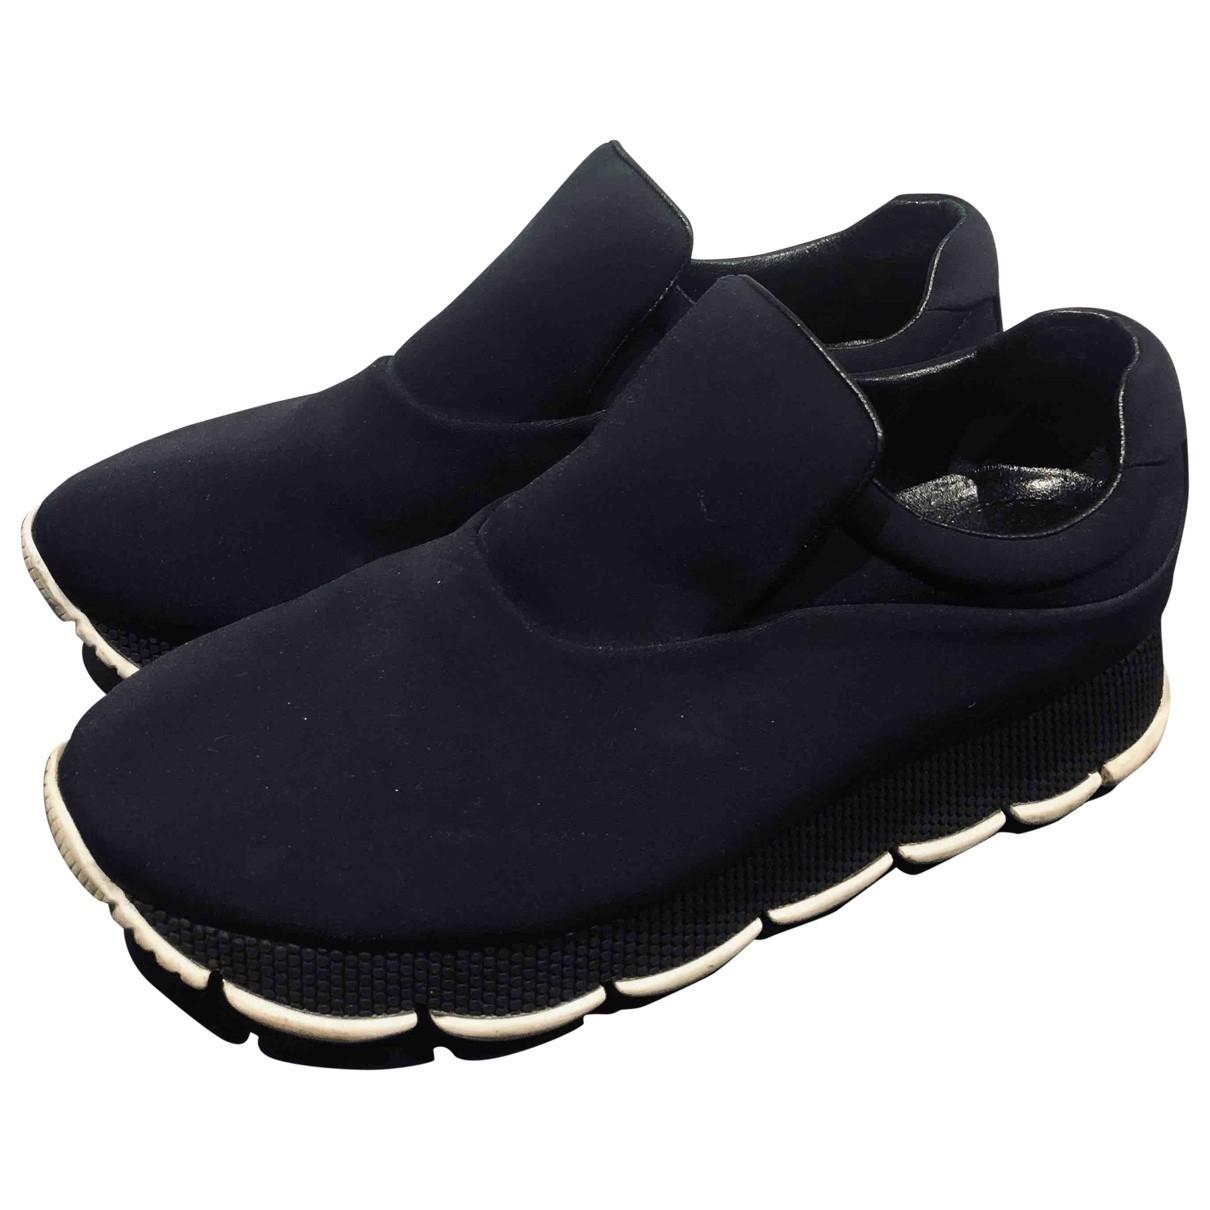 Prada \N Sneakers in  Schwarz Kautschuk